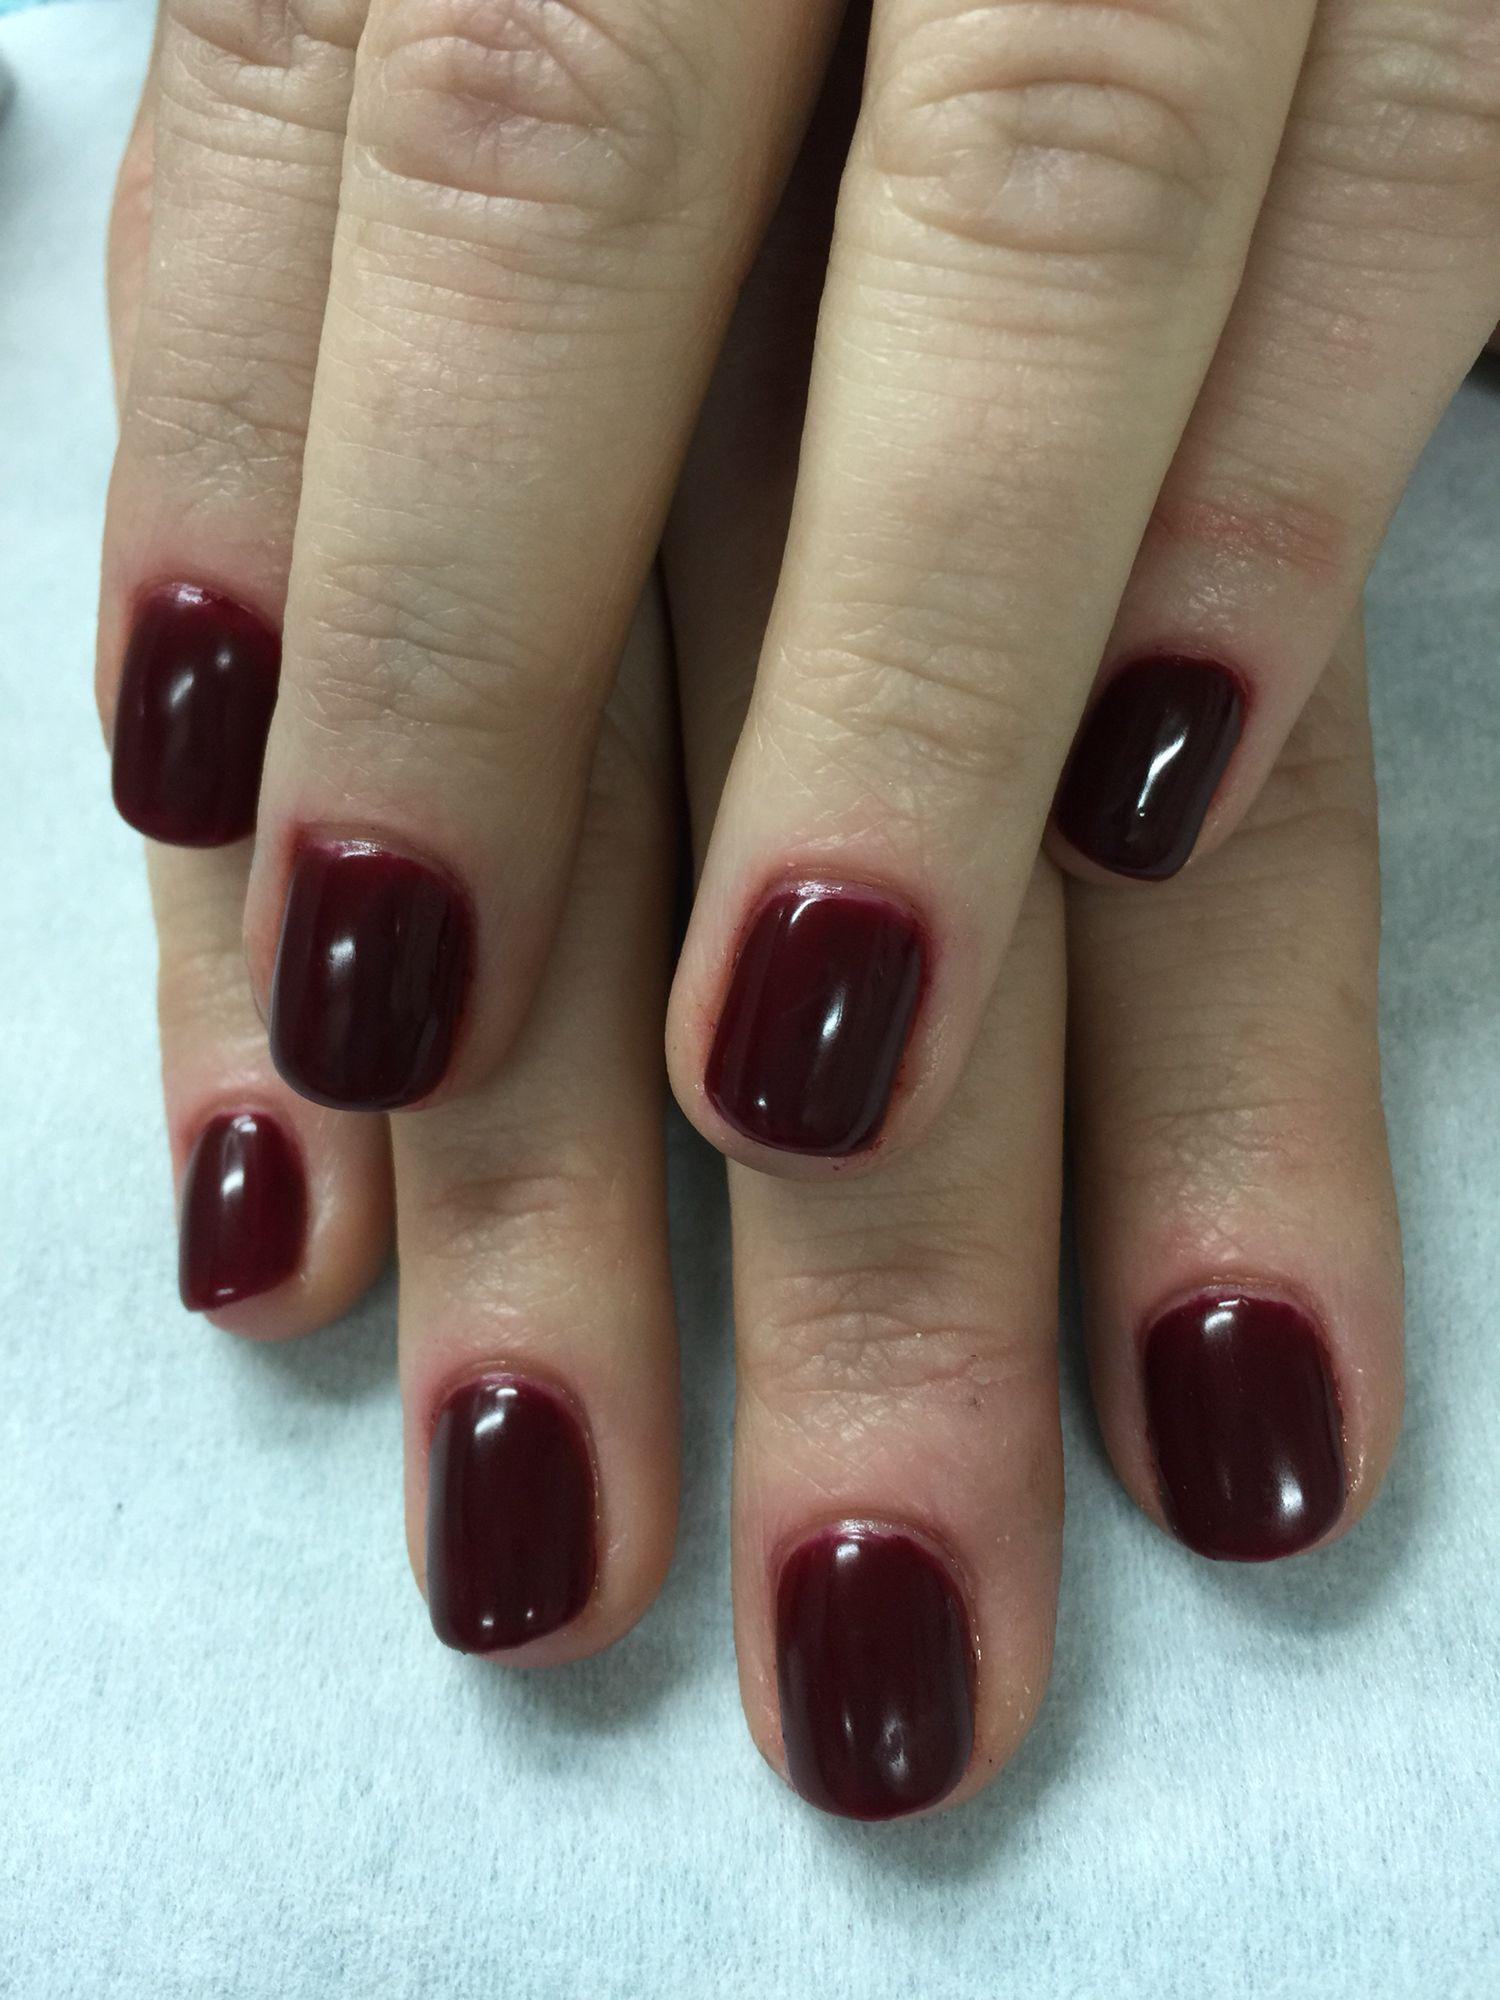 Fall burgundy wine gel polish over non-toxic odorless hard gel ...